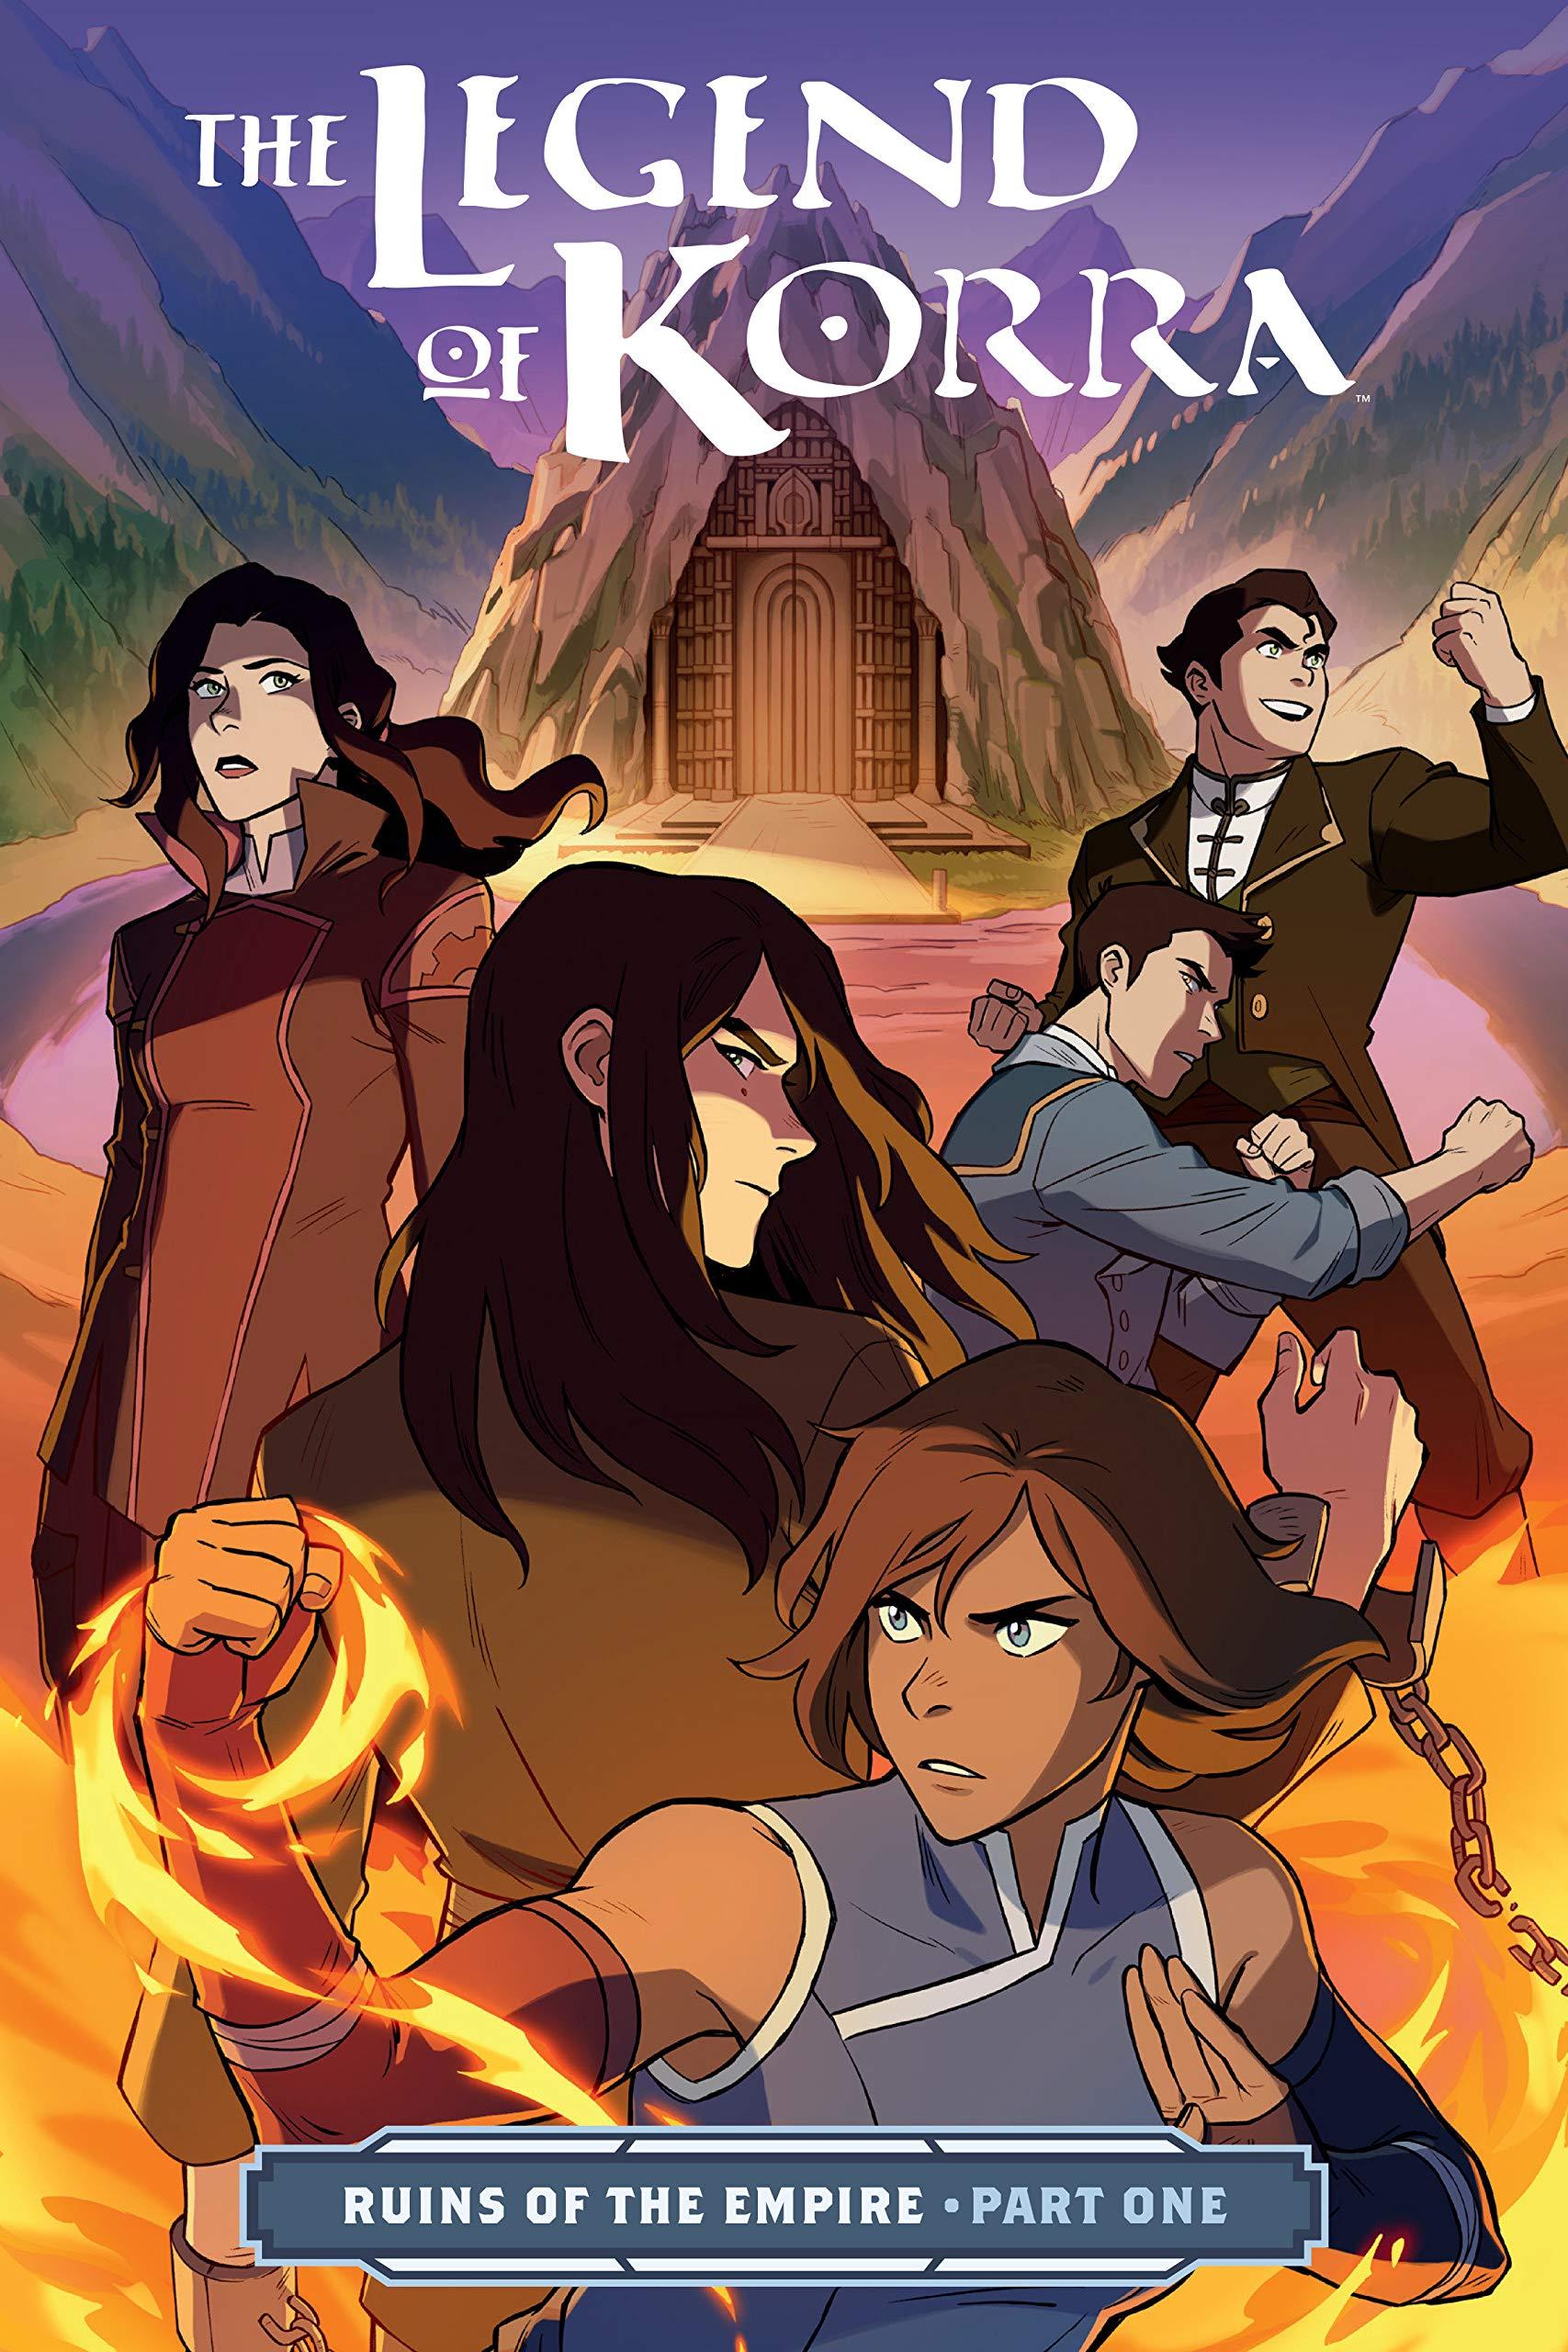 The Legend of Korra: Ruins of the Empire Part One : DiMartino, Michael Dante, Konietzko, Bryan, Wong, Michelle, Ng, Killian: Amazon.fr: Livres